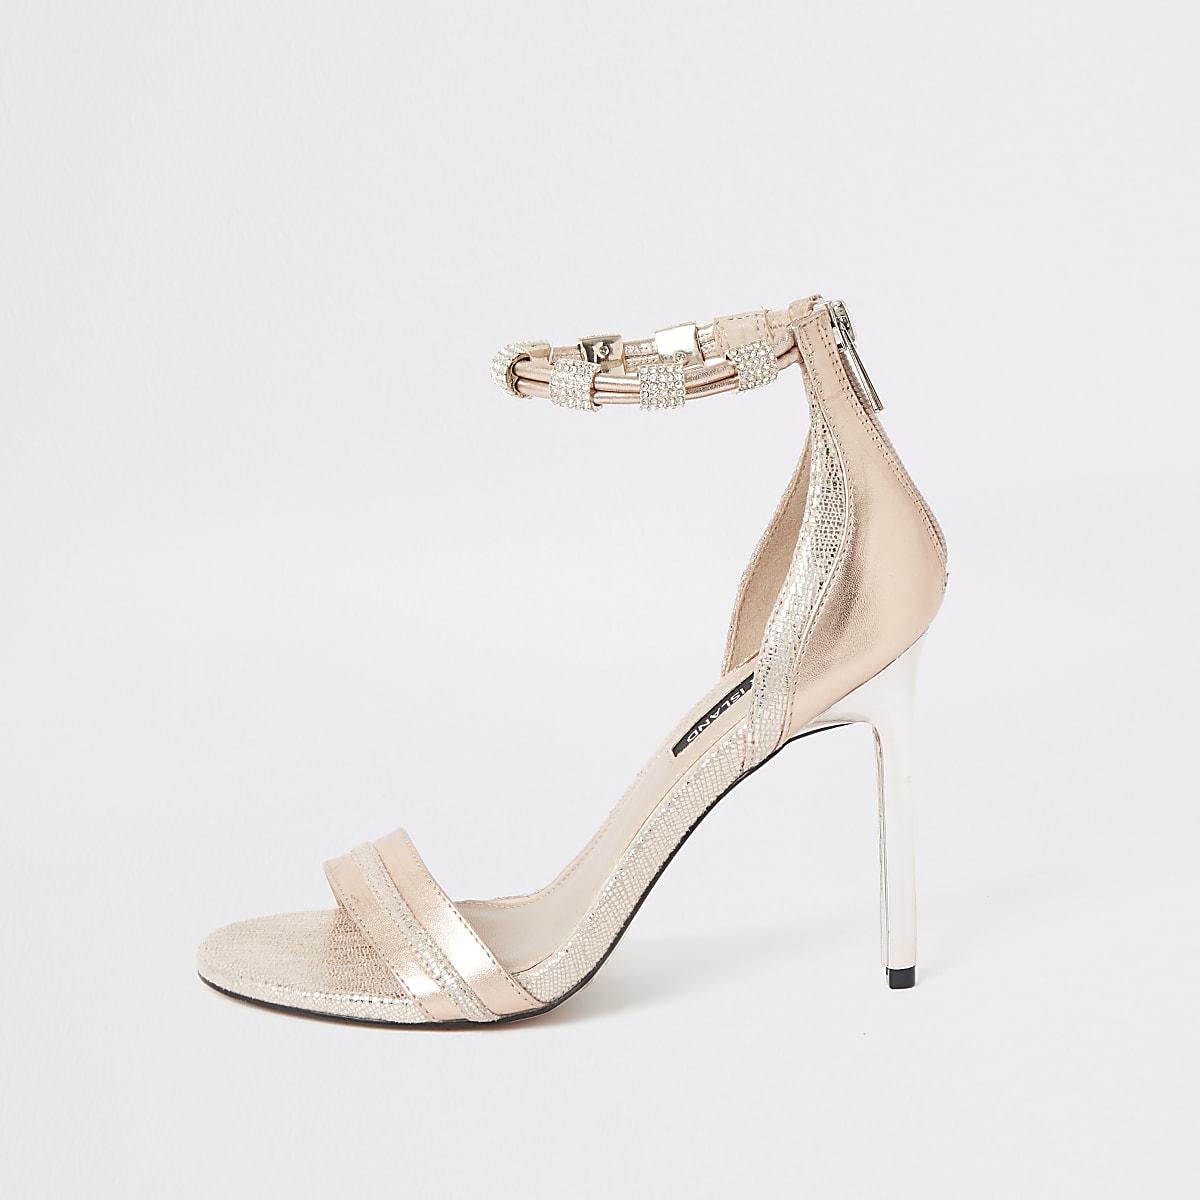 Roze sandalen met hoge hak en diamanté enkelbandje